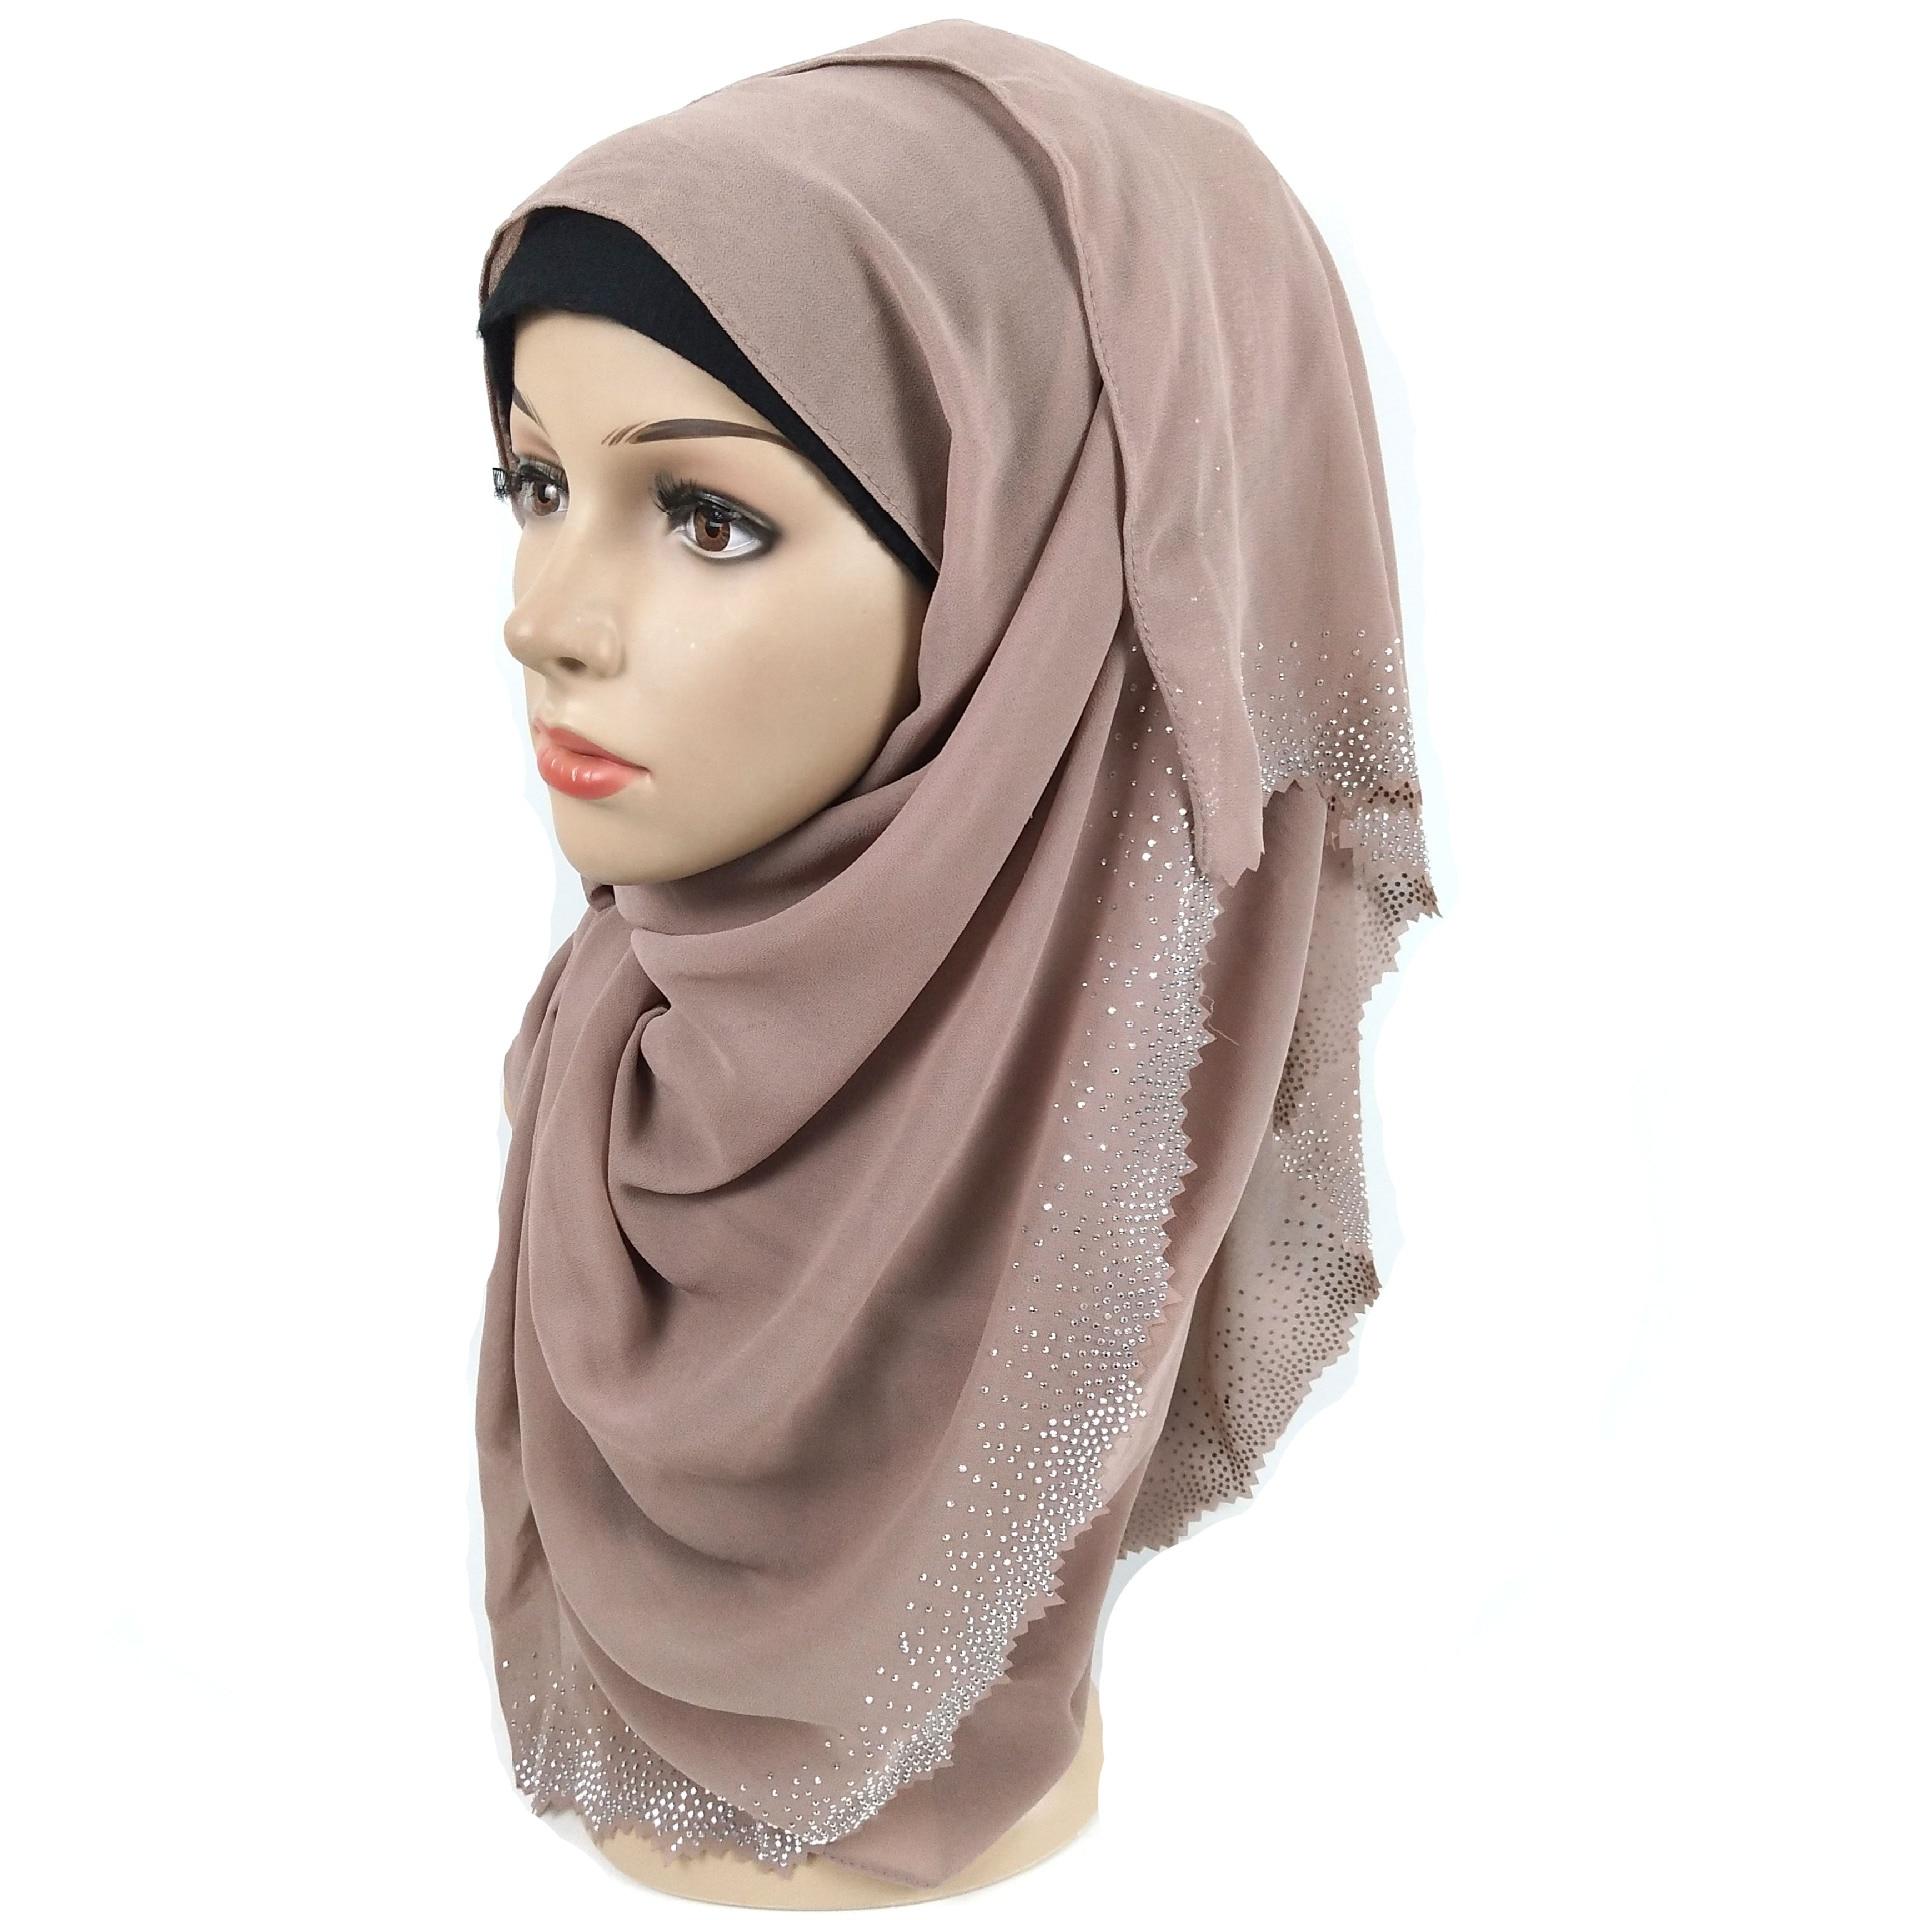 Image 2 - New Hollow Hot Diamond Pearl Chiffon Headscarf Muslim Hijab Long Towel Malaysian ShawlIslamic Clothing